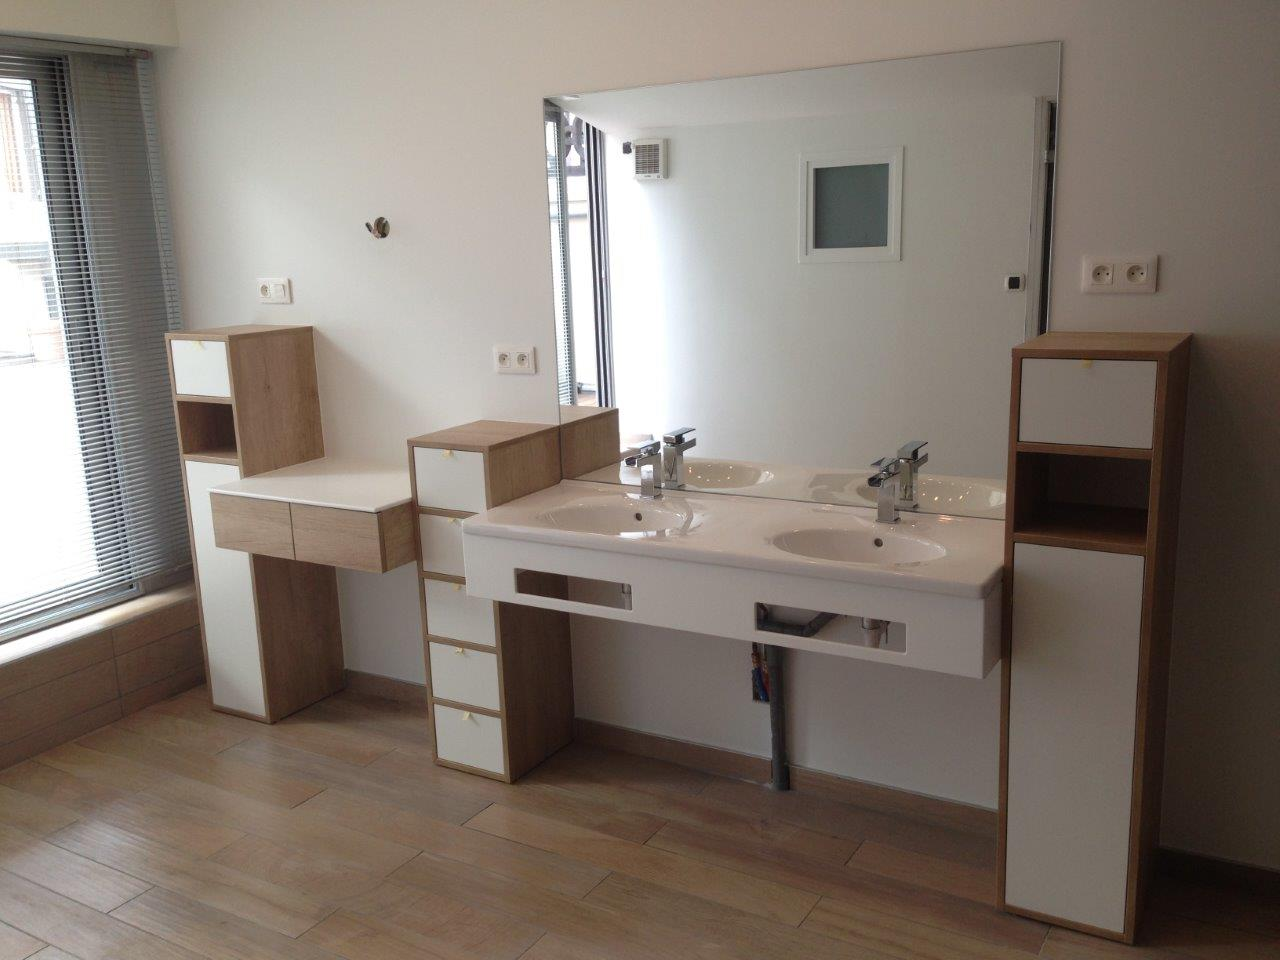 cr ation de salle de bains admin. Black Bedroom Furniture Sets. Home Design Ideas